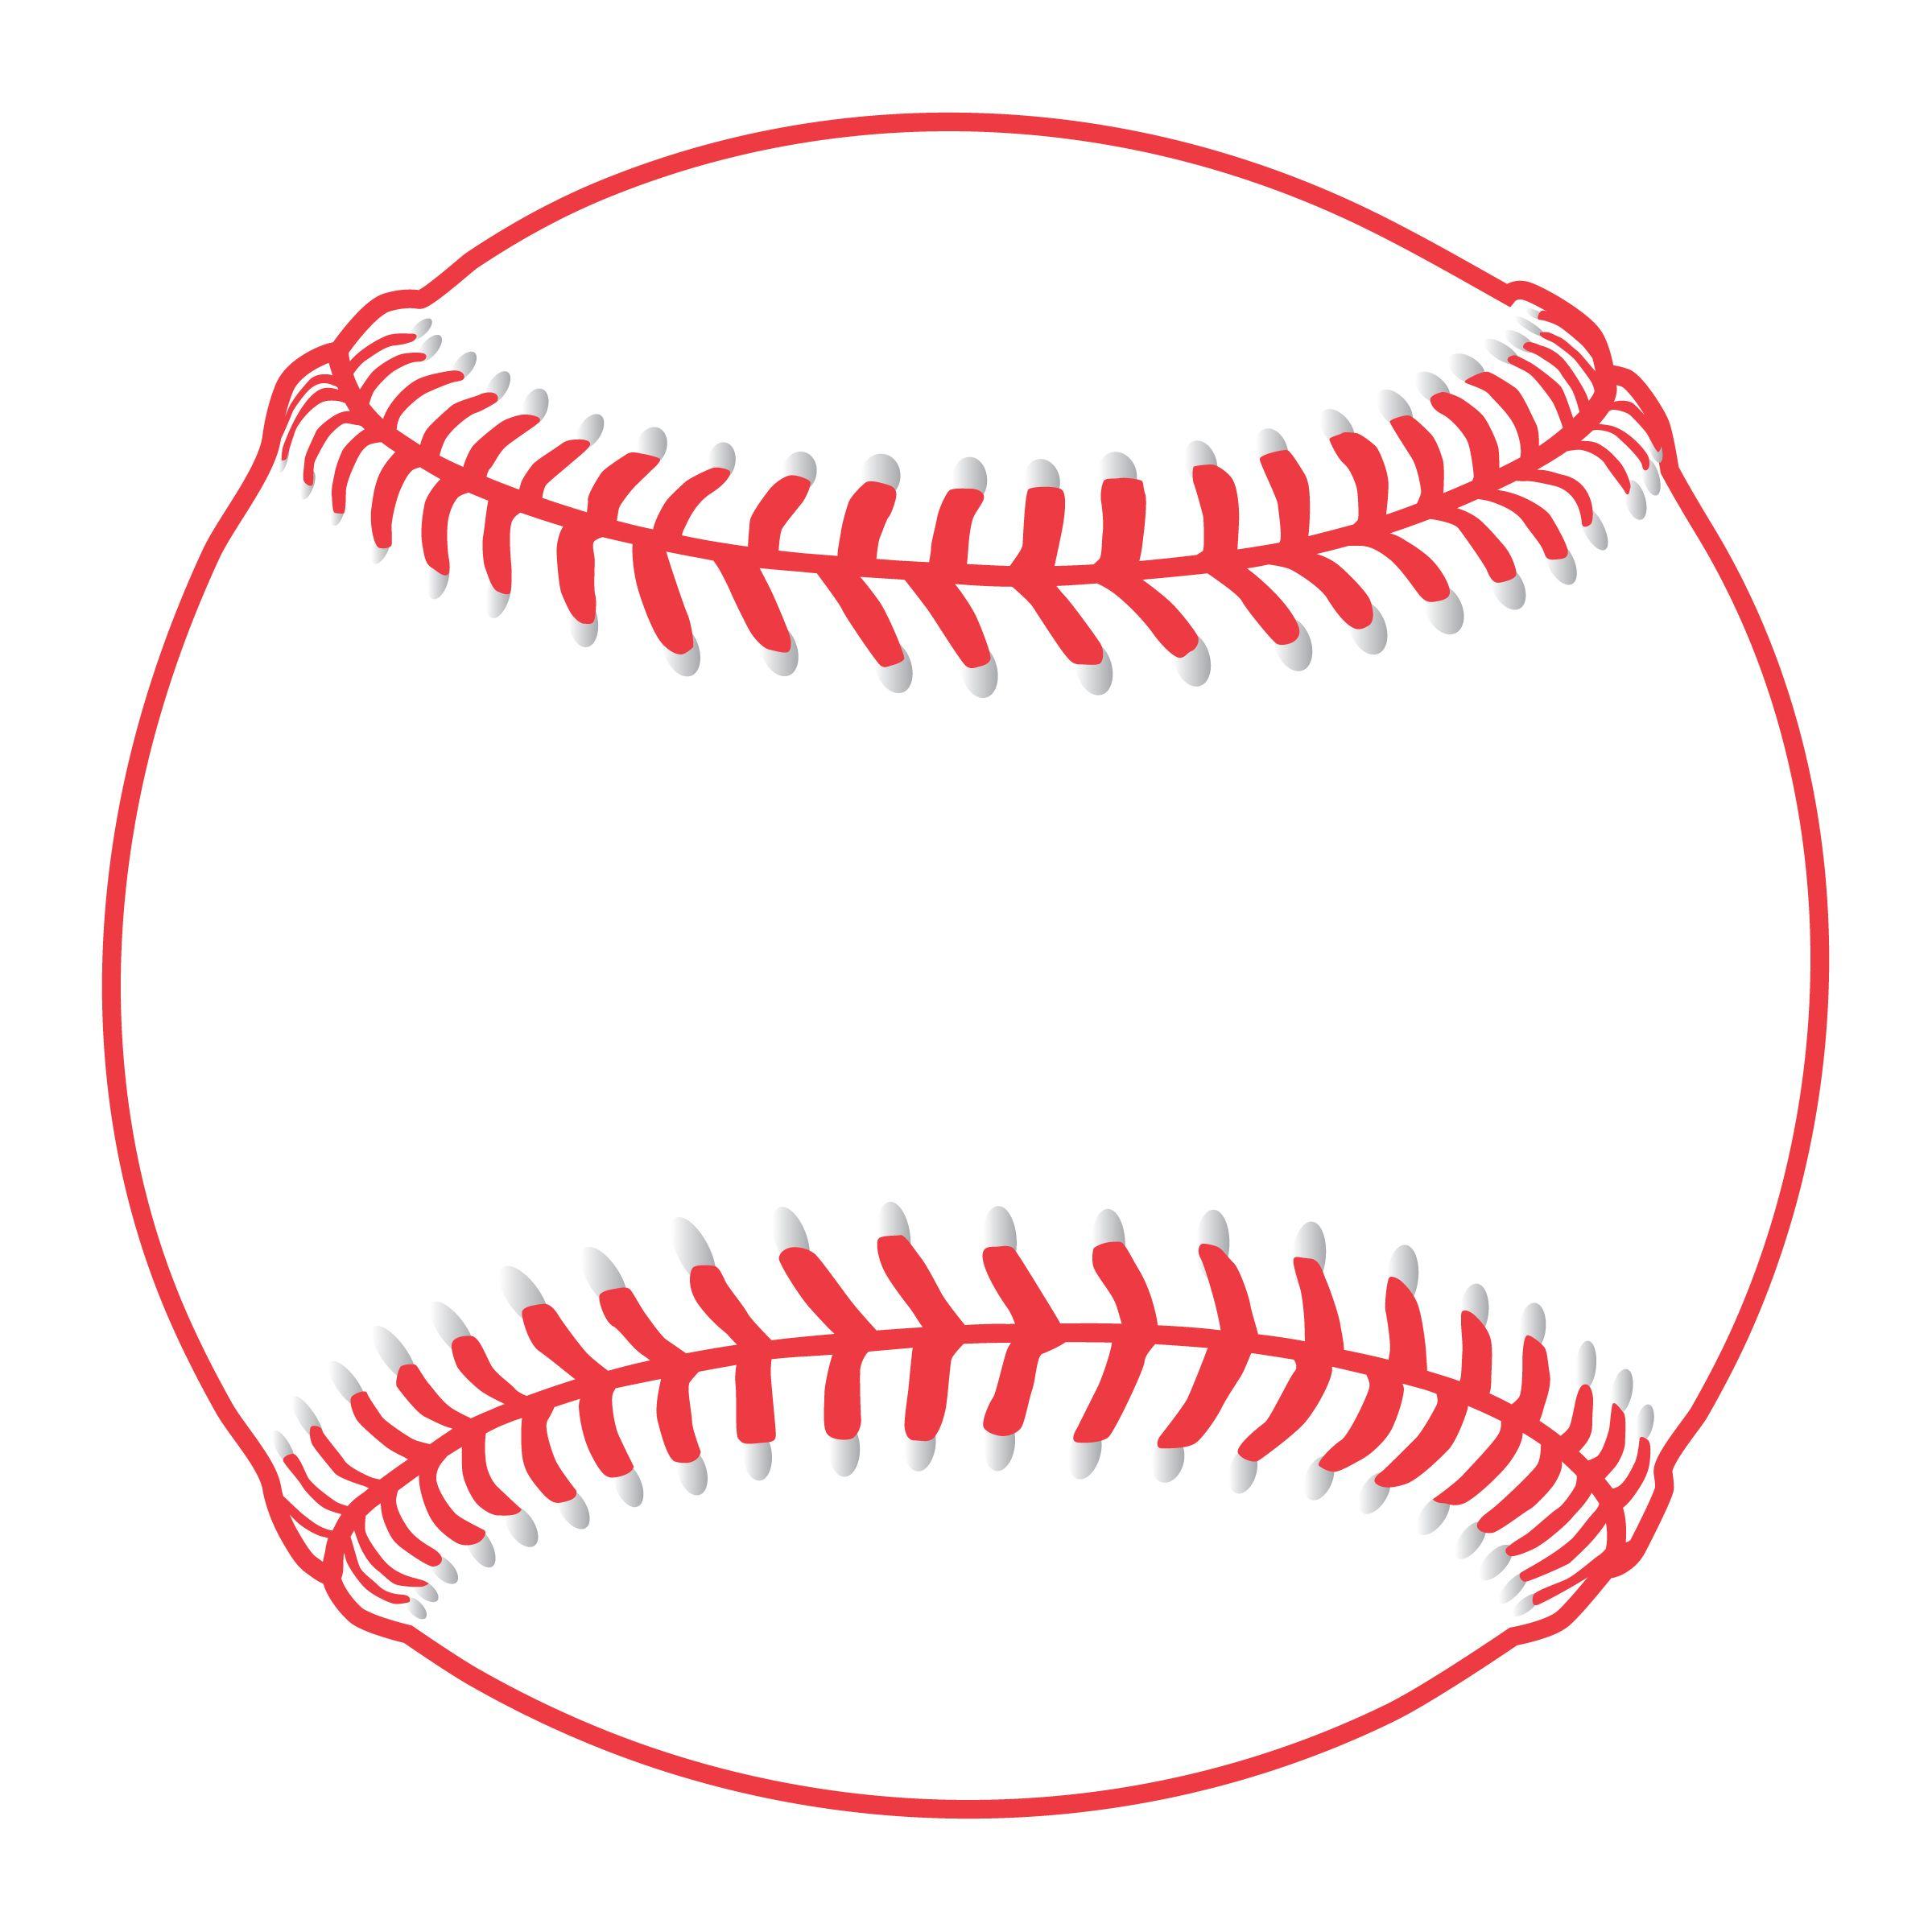 Baseball clipart 4